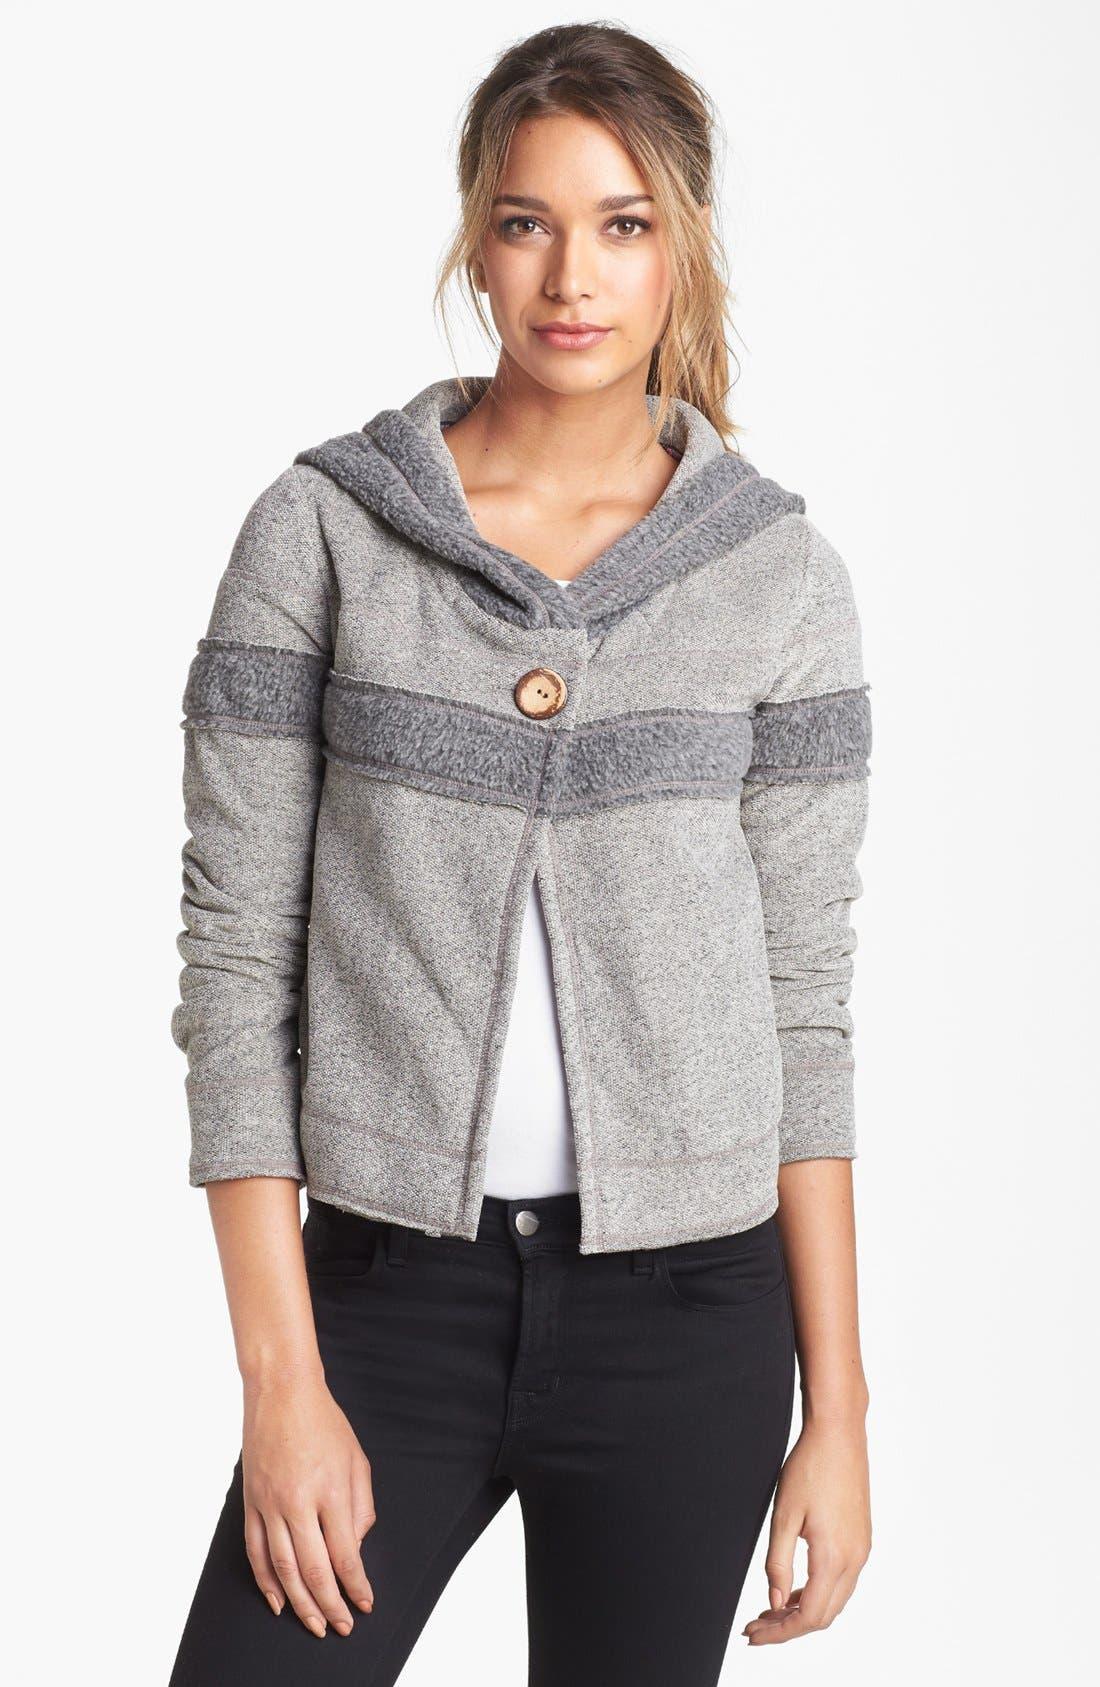 Alternate Image 1 Selected - prAna 'Lanie' Jacket